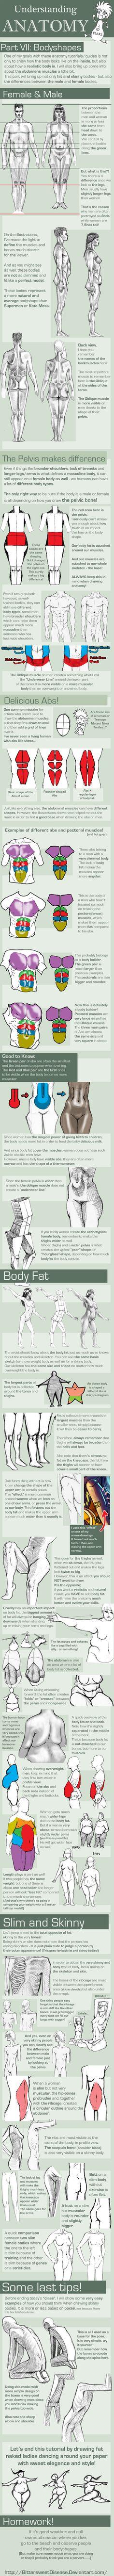 Understanding Anatomy: Body Shapes